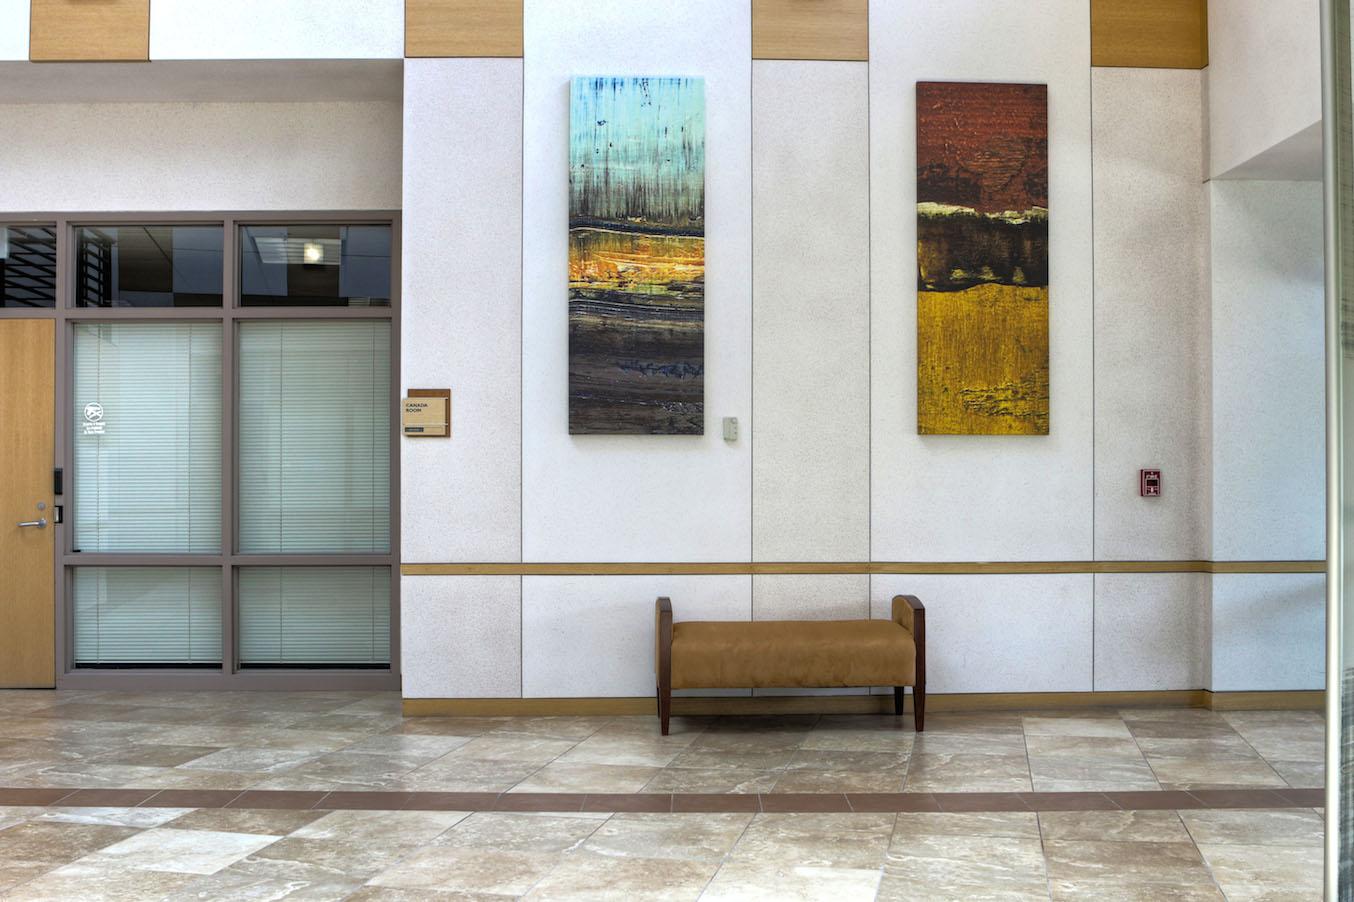 2-Vanta-Properties-Deming-Way-Concepts-in-Art-LLC